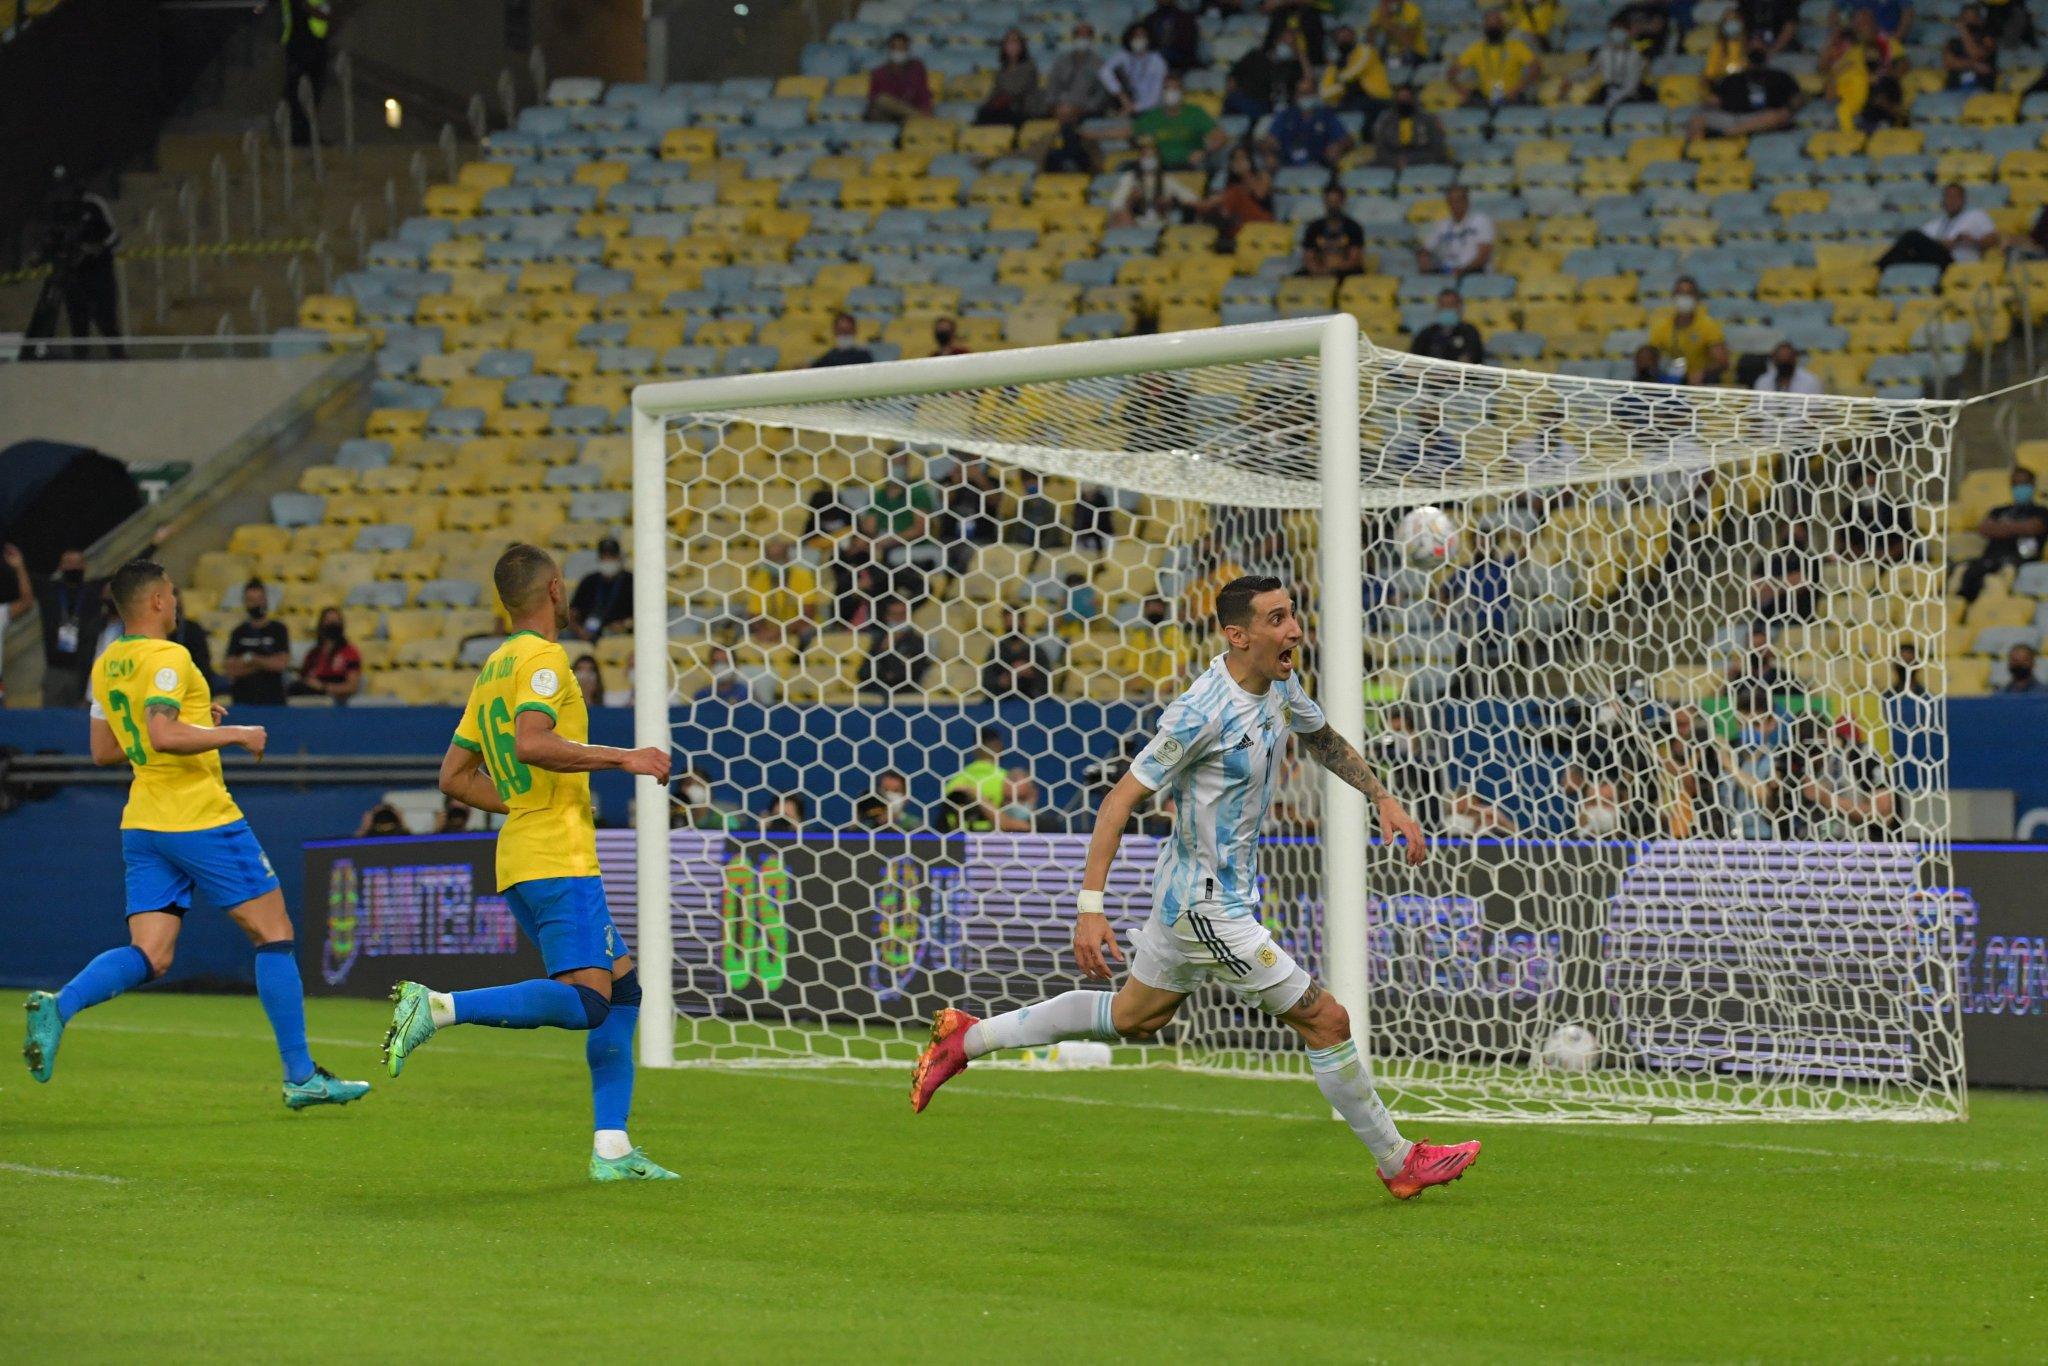 Maracanazo!! La Argentina de Messi se corona campeón de América tras vencer en la final a Brasil